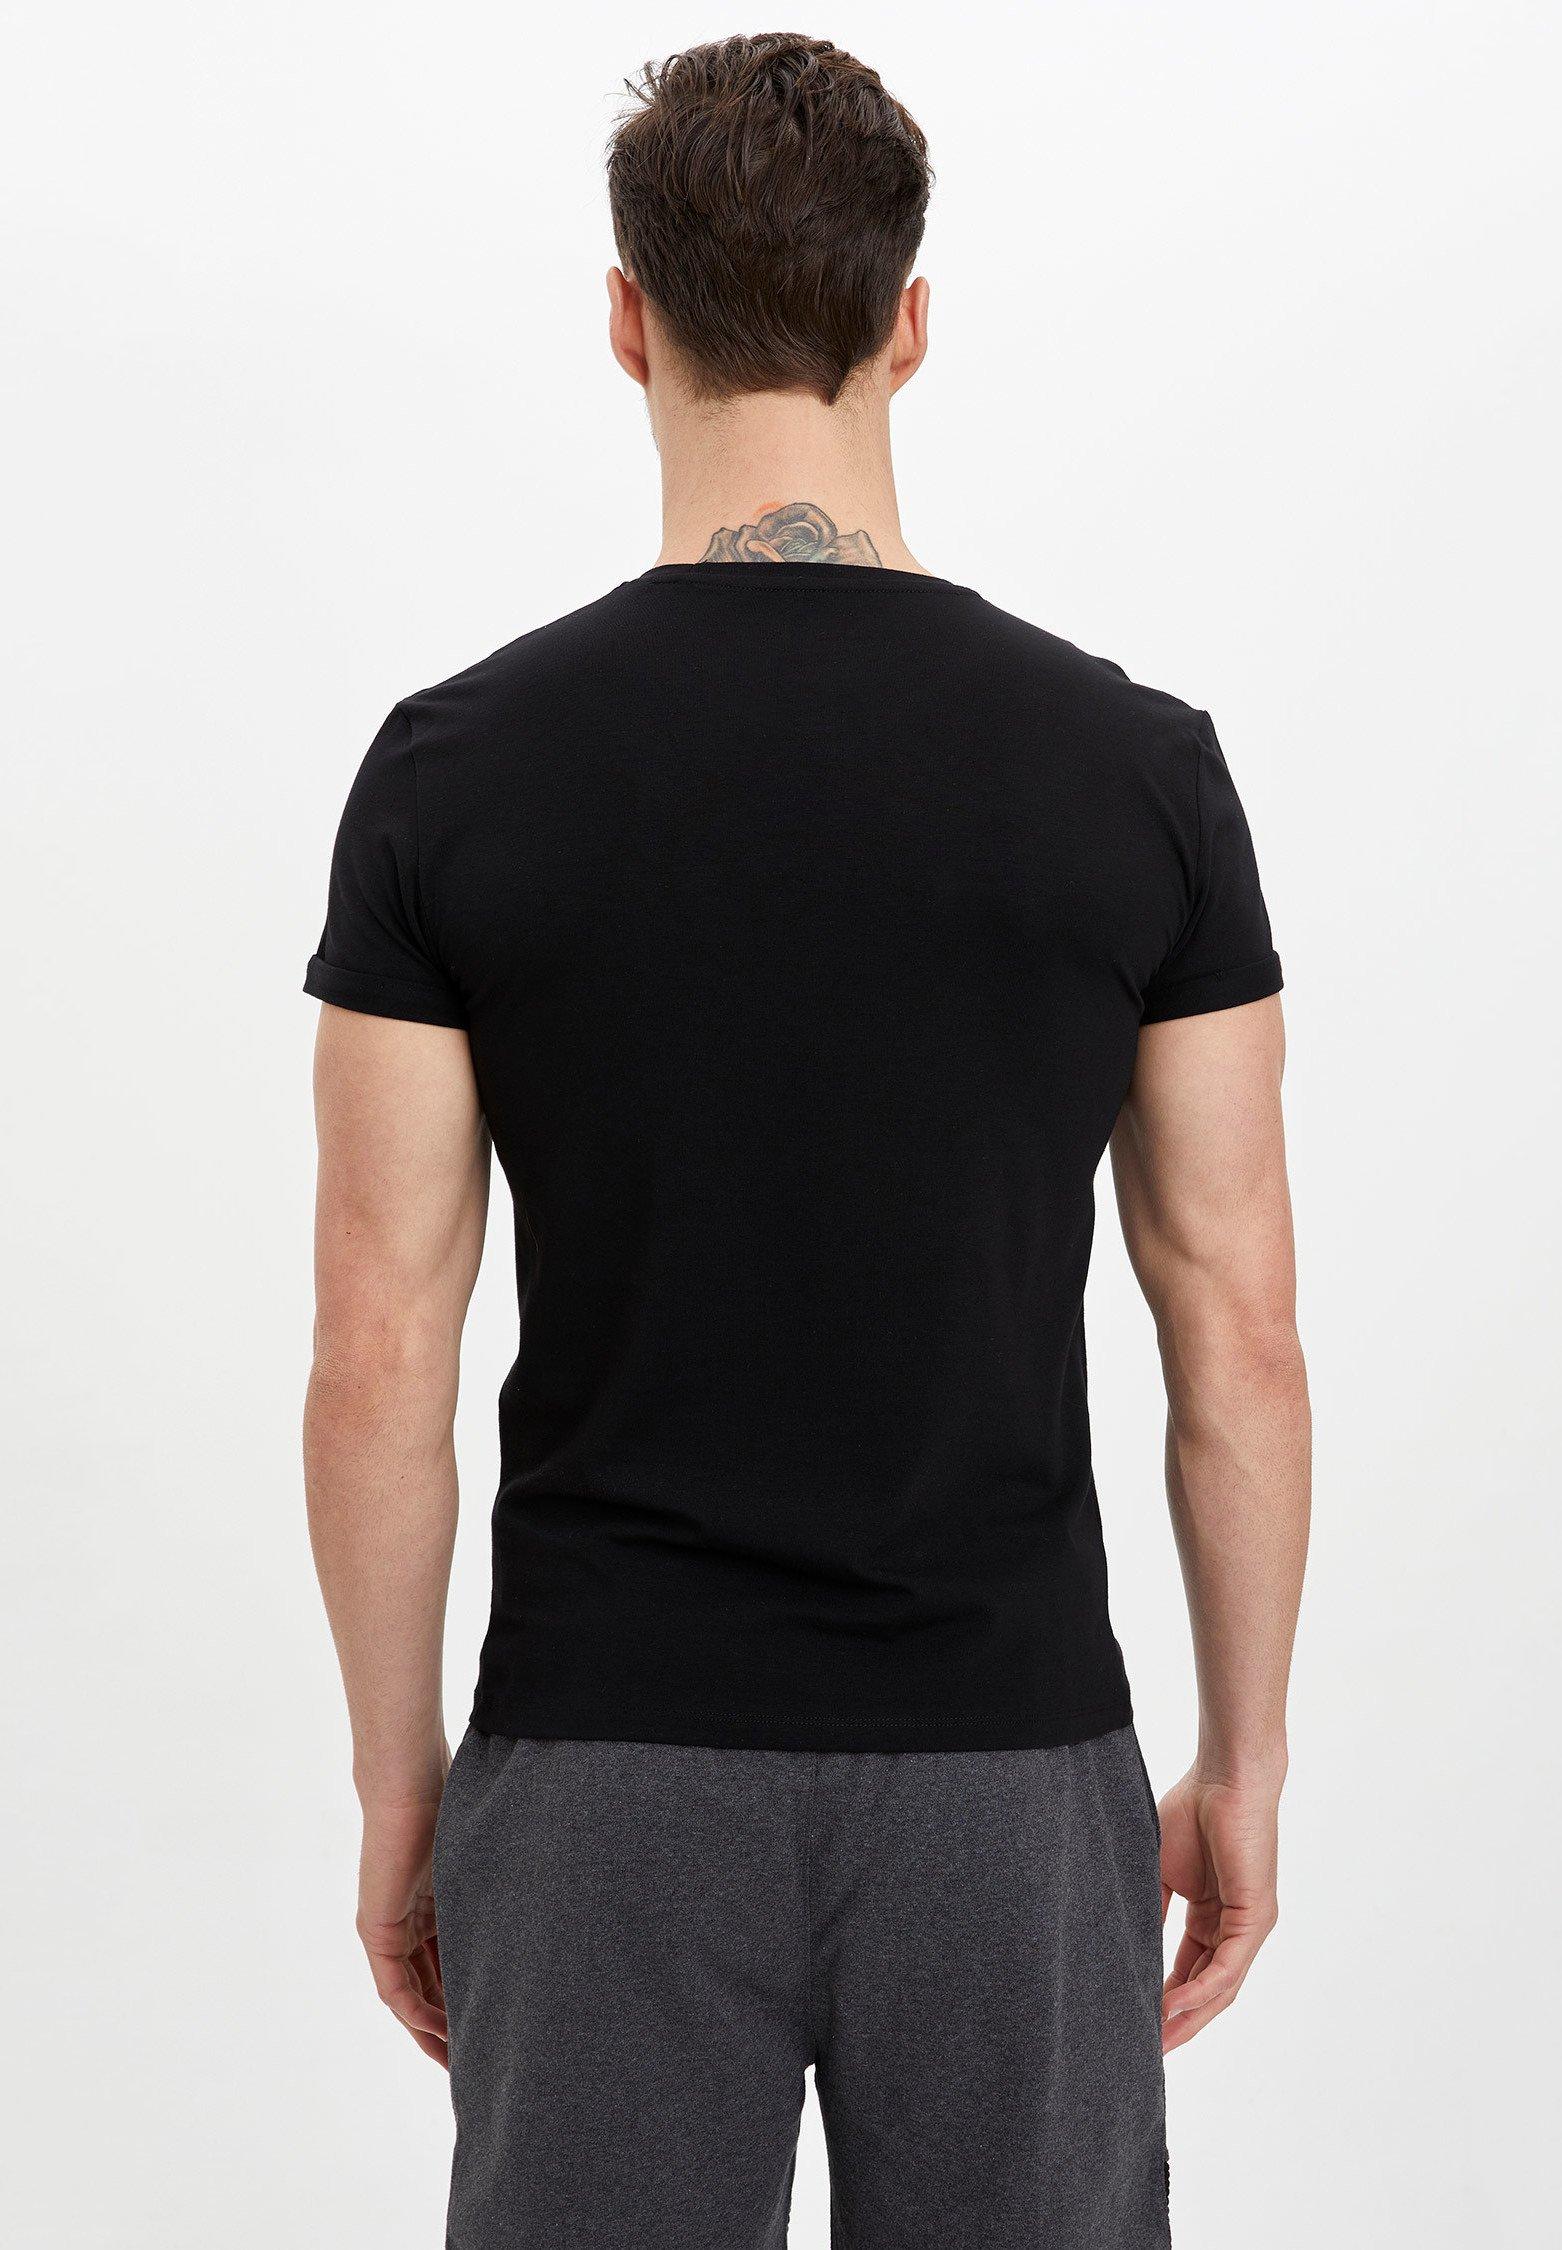 DeFacto Basic T-shirt - black 8Awjh